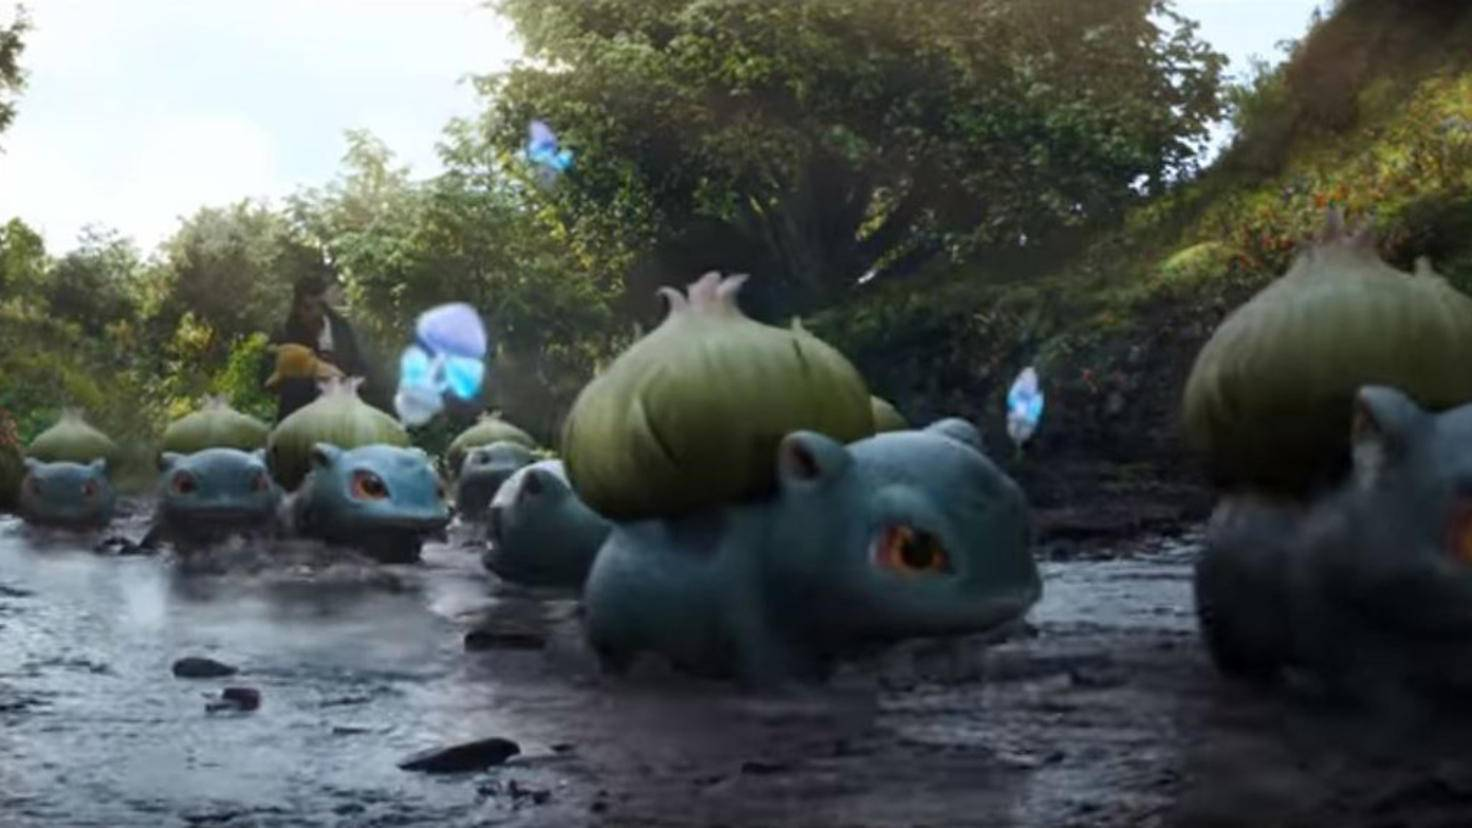 Bisasam in Pokémon Detective Pikachu